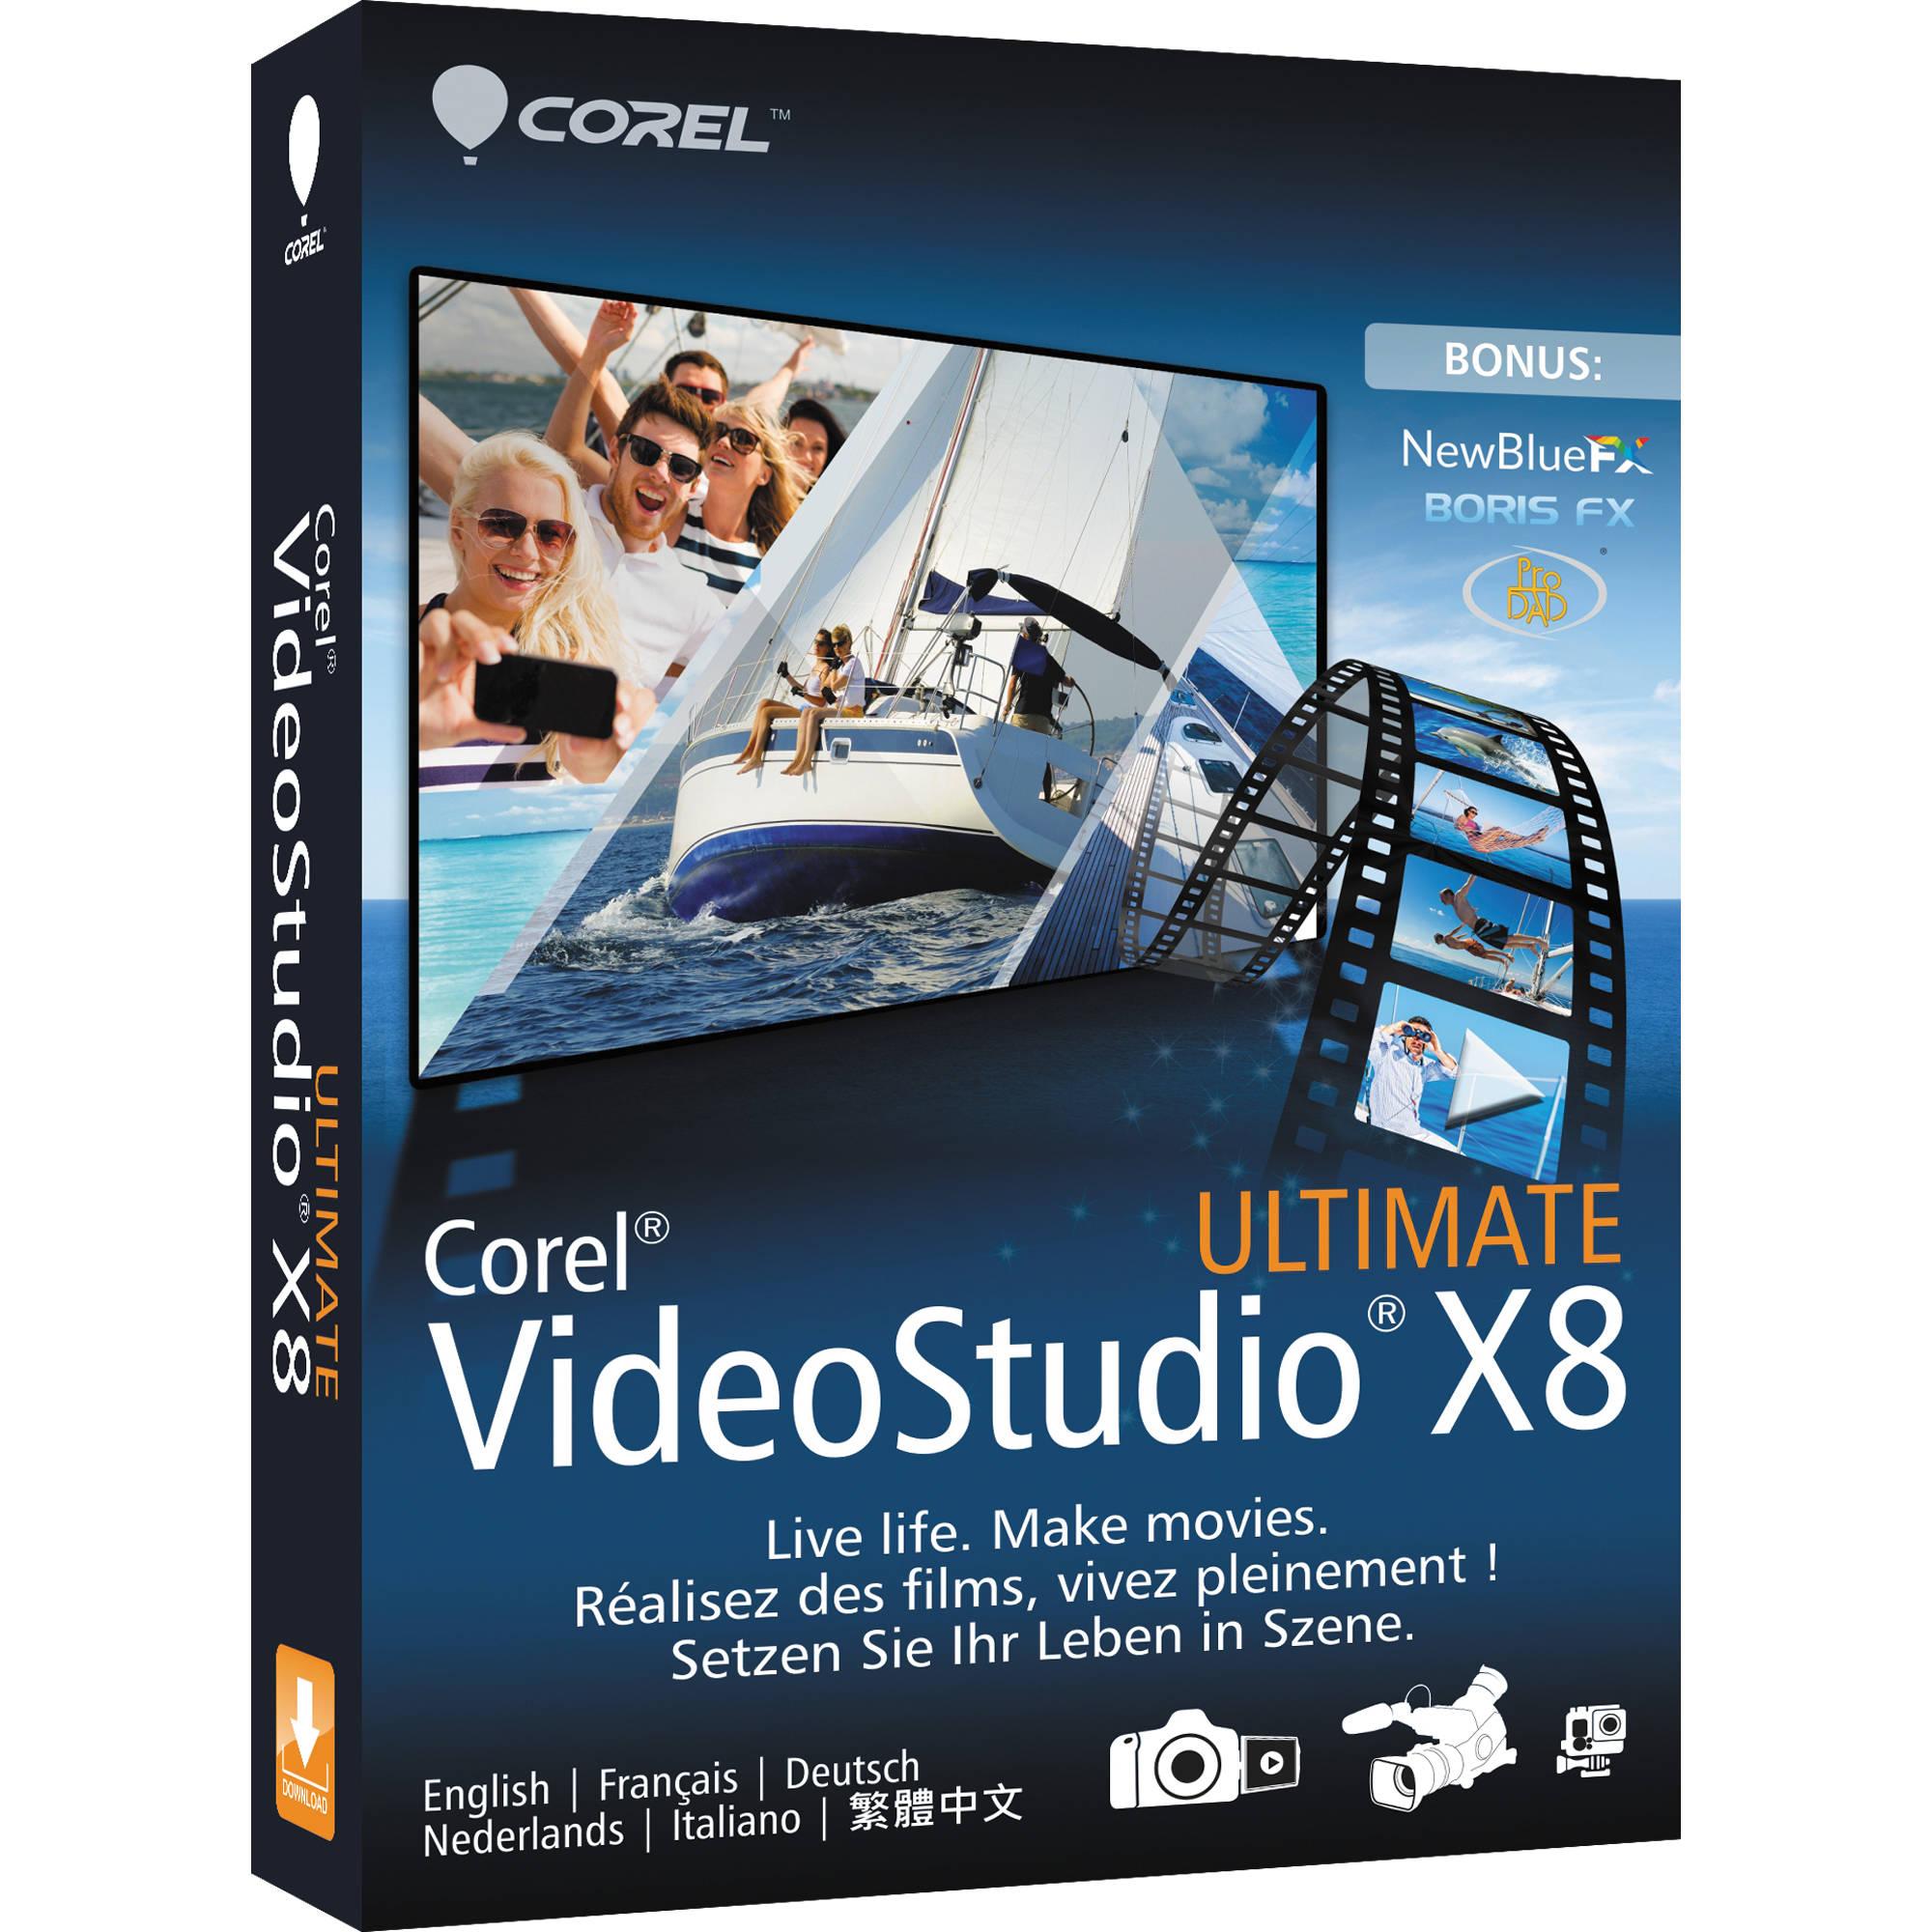 Corel VideoStudio X8 Image